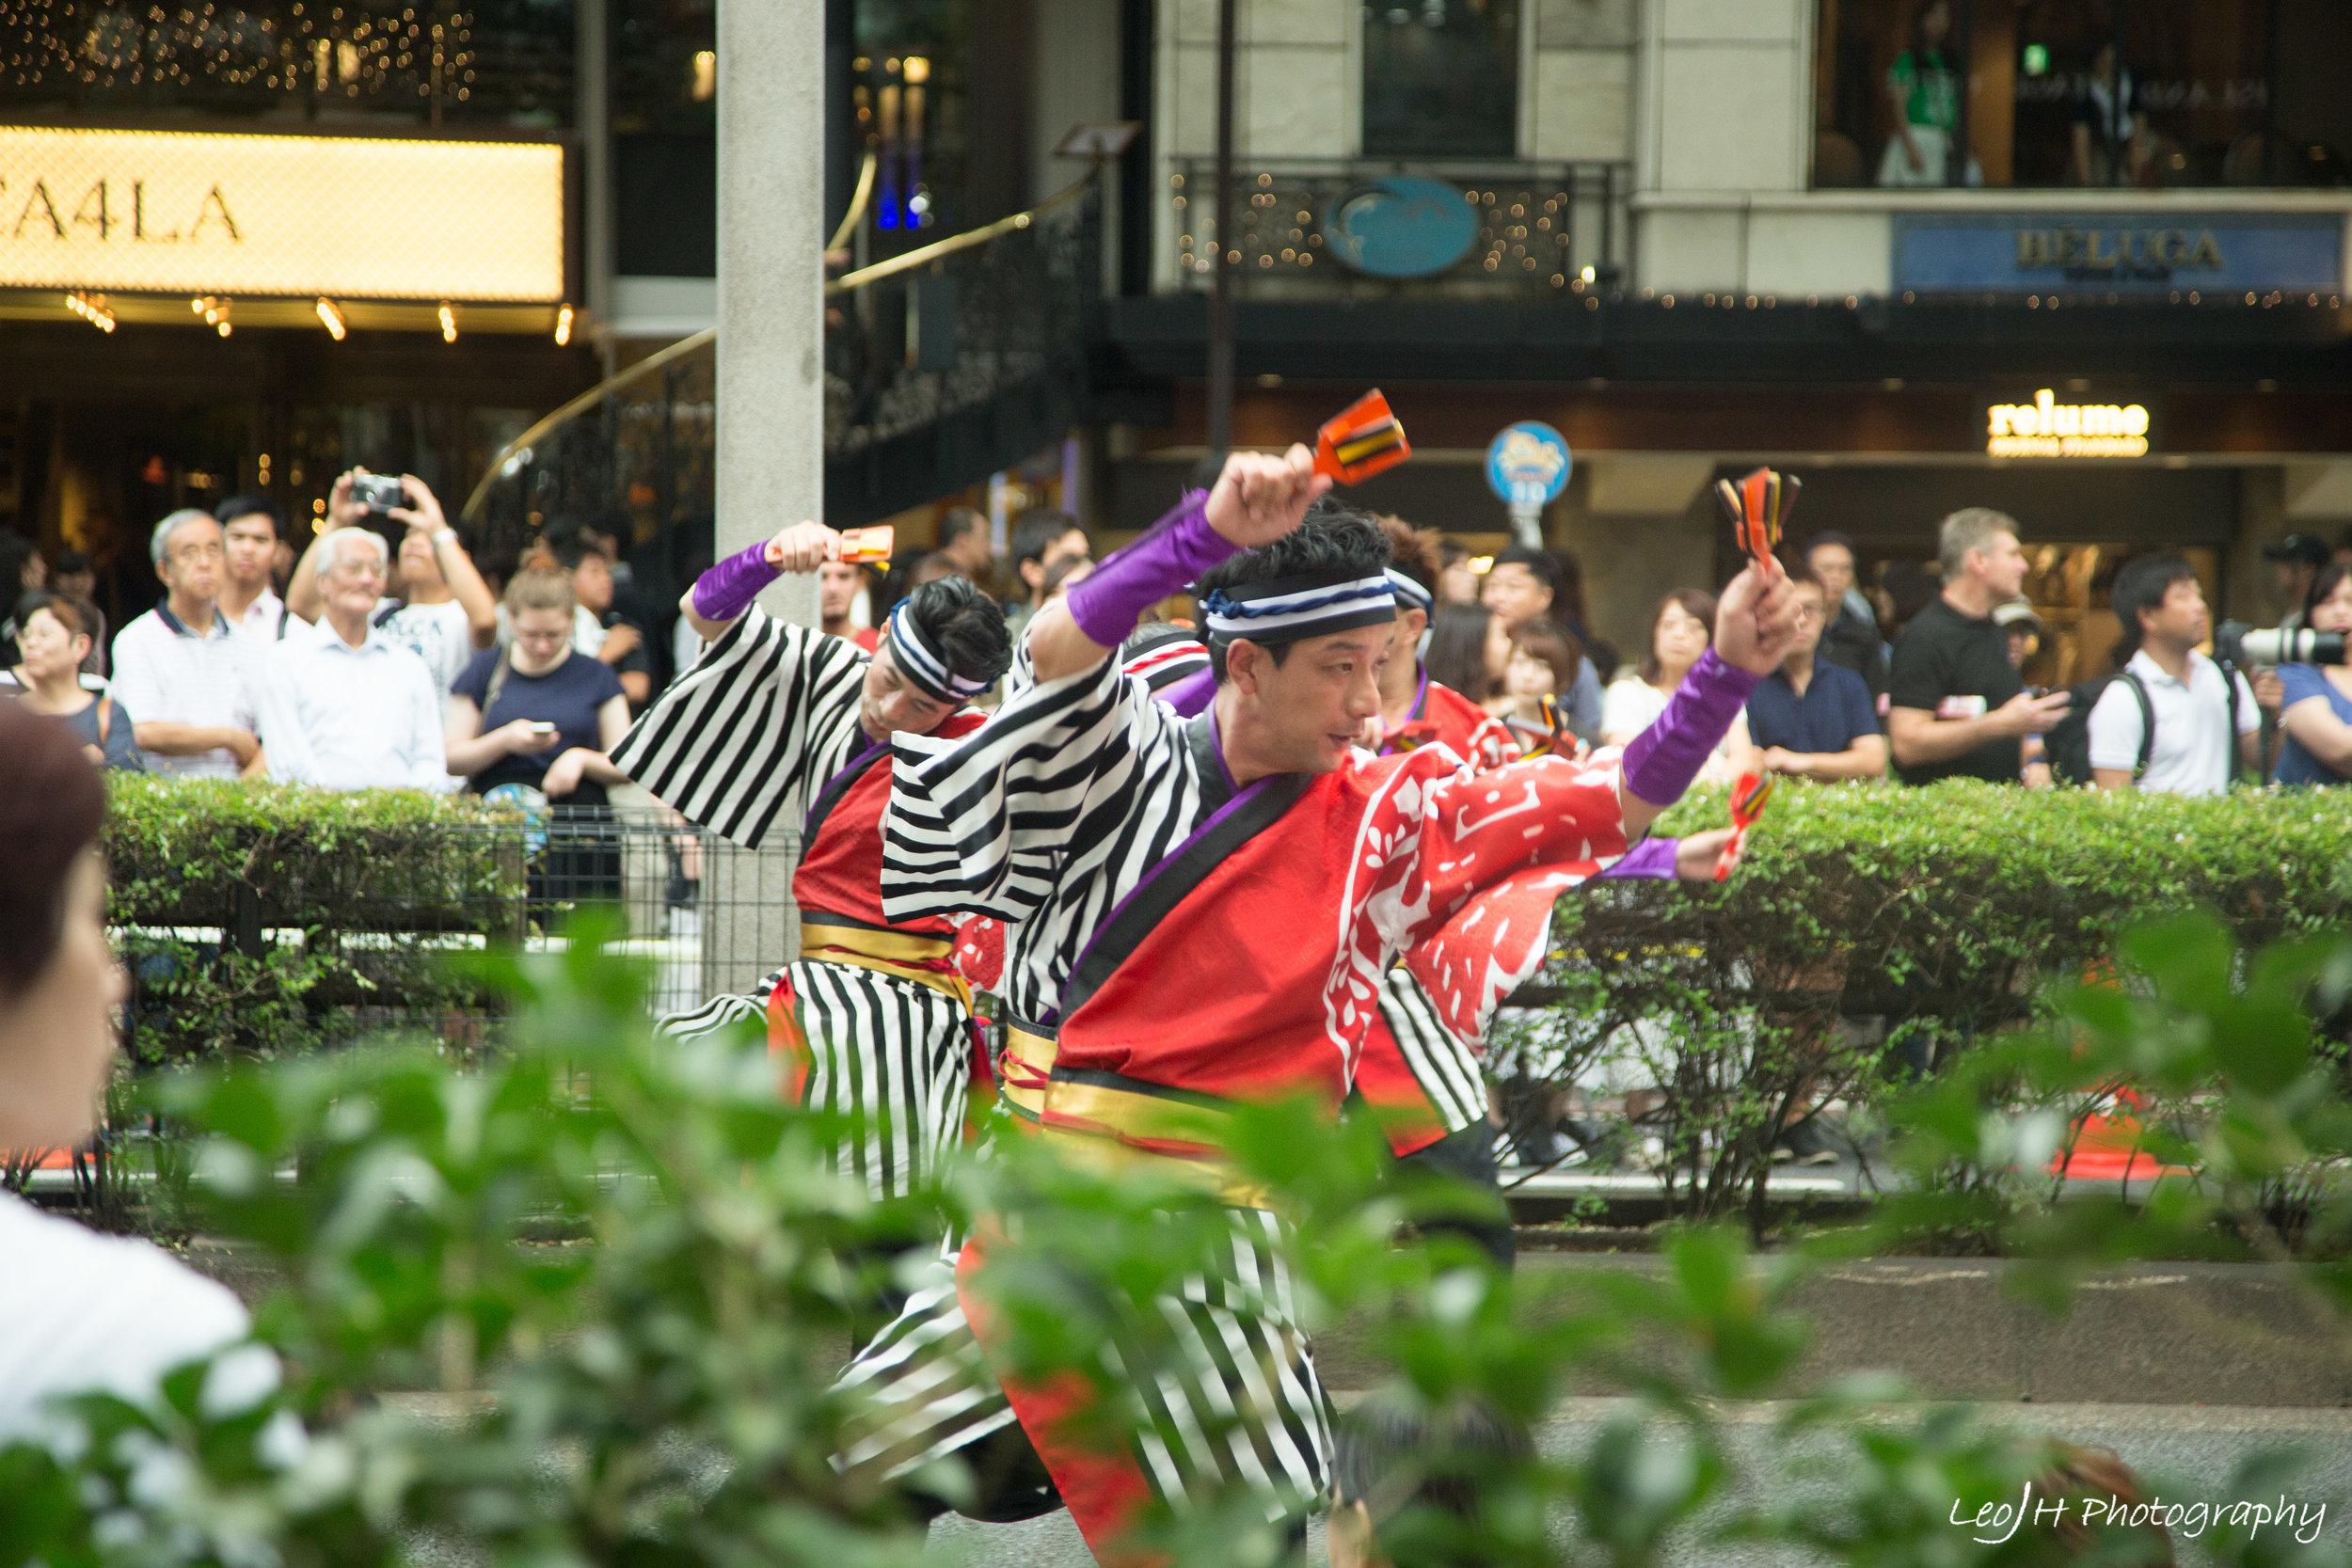 Harajuku Omotesando Genki Matsuri Super Yosakoi Festival. One of the many groups performing